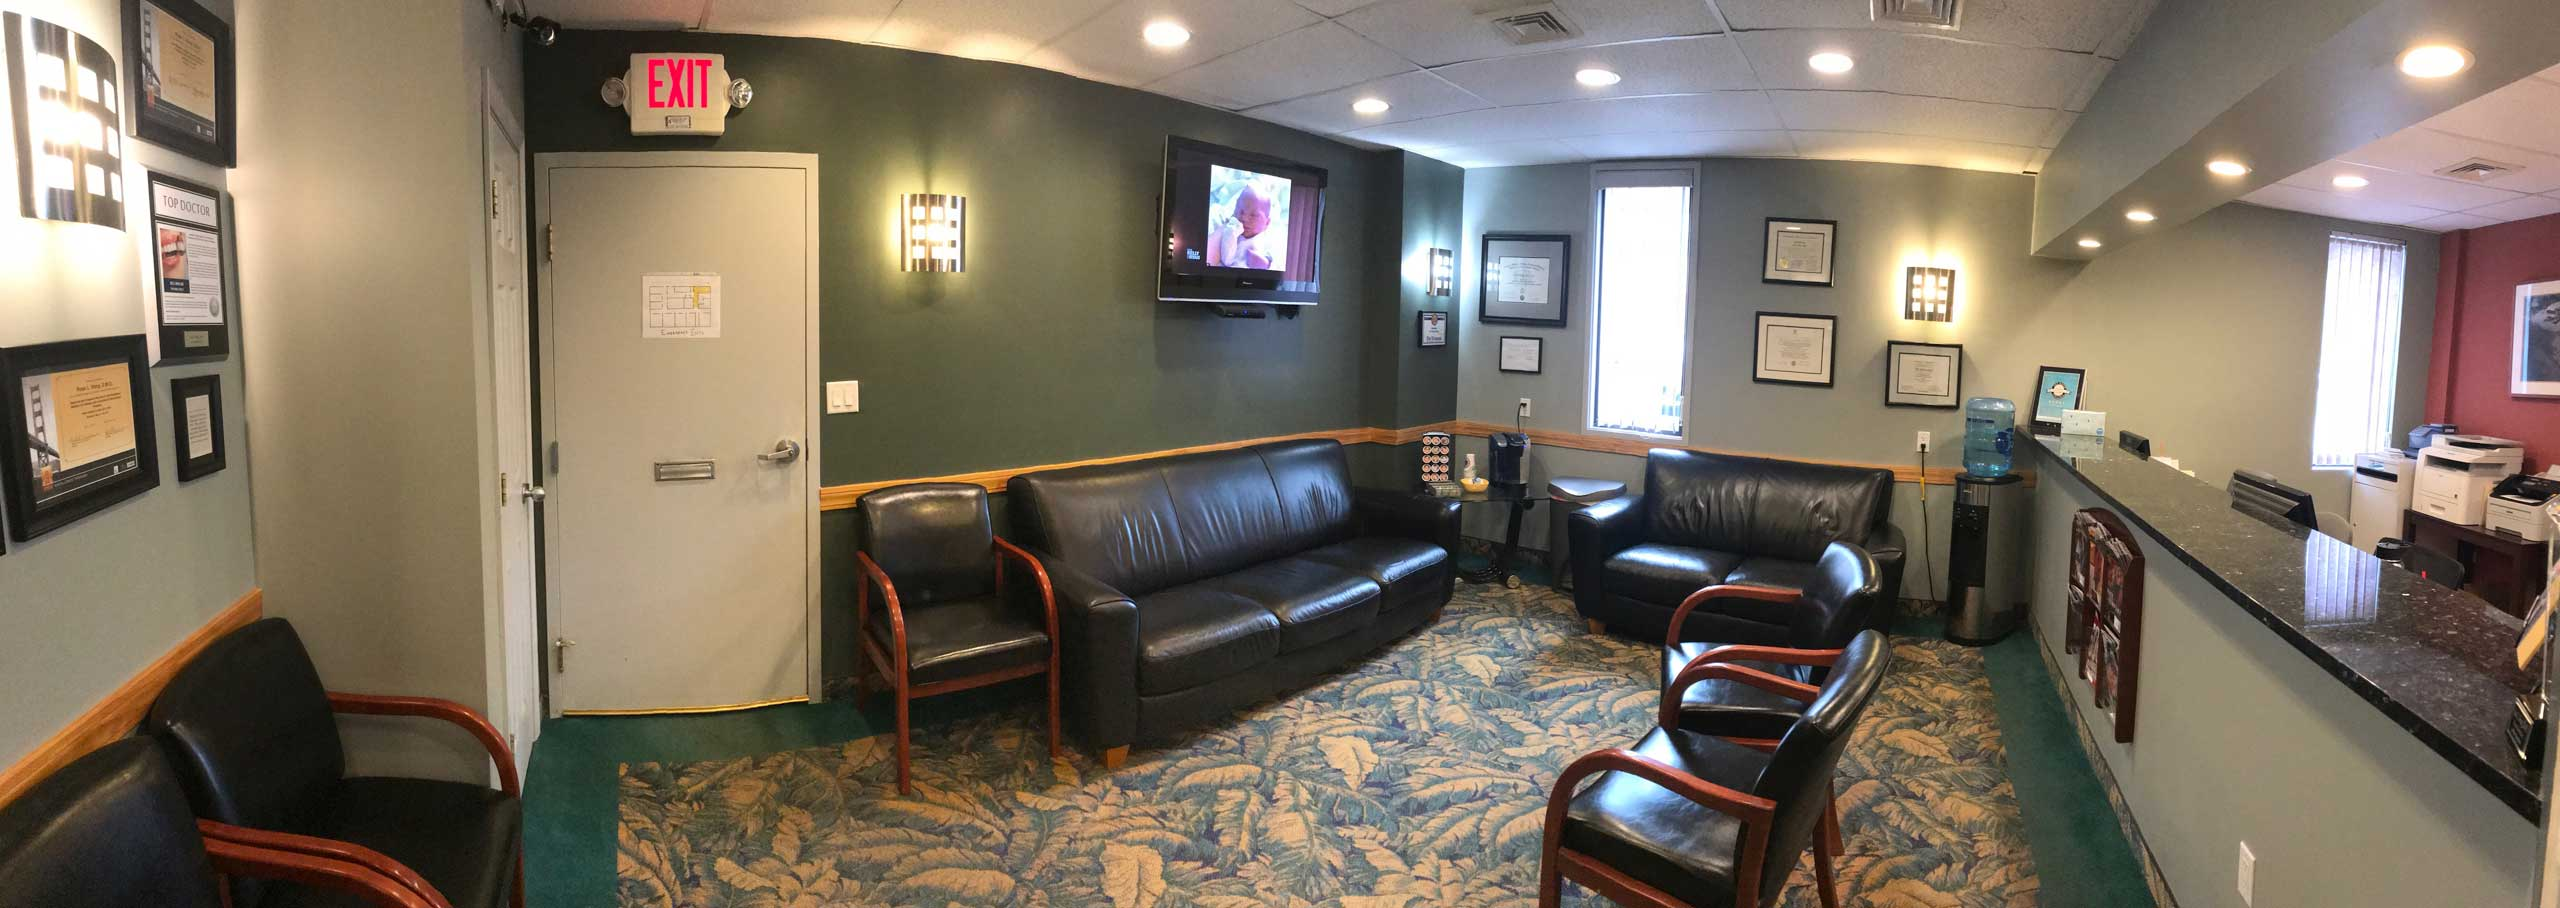 Rose Dental Office   Nashua NH   Family Dentistry